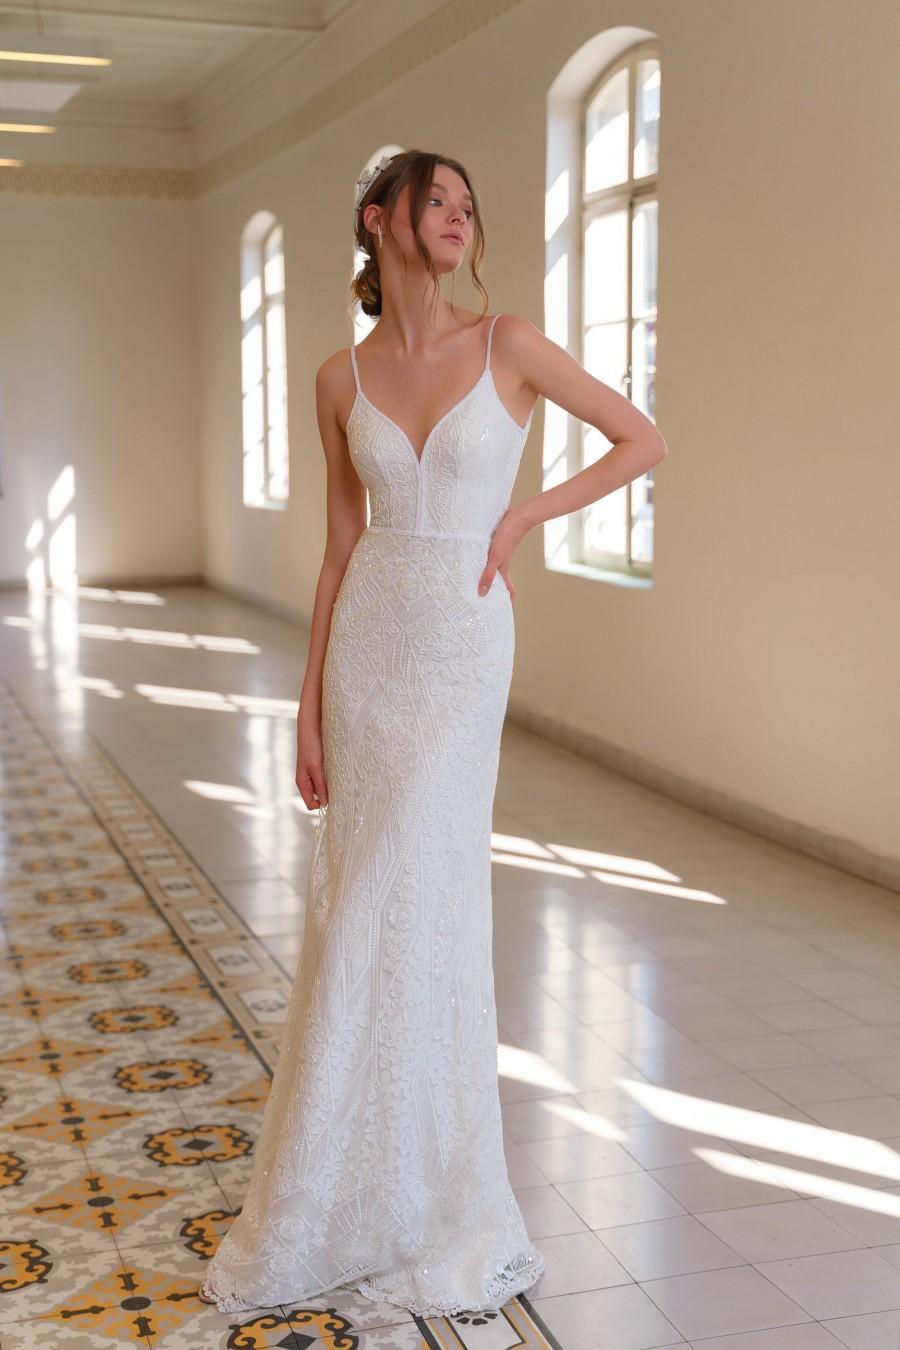 Mariage - White Bride Dress, Bohemian Wedding Dress, V Neck Bride Dress, Wedding Gown, Unique Wedding Dress, Bridal Dress, Beaded Lace Wedding Dress